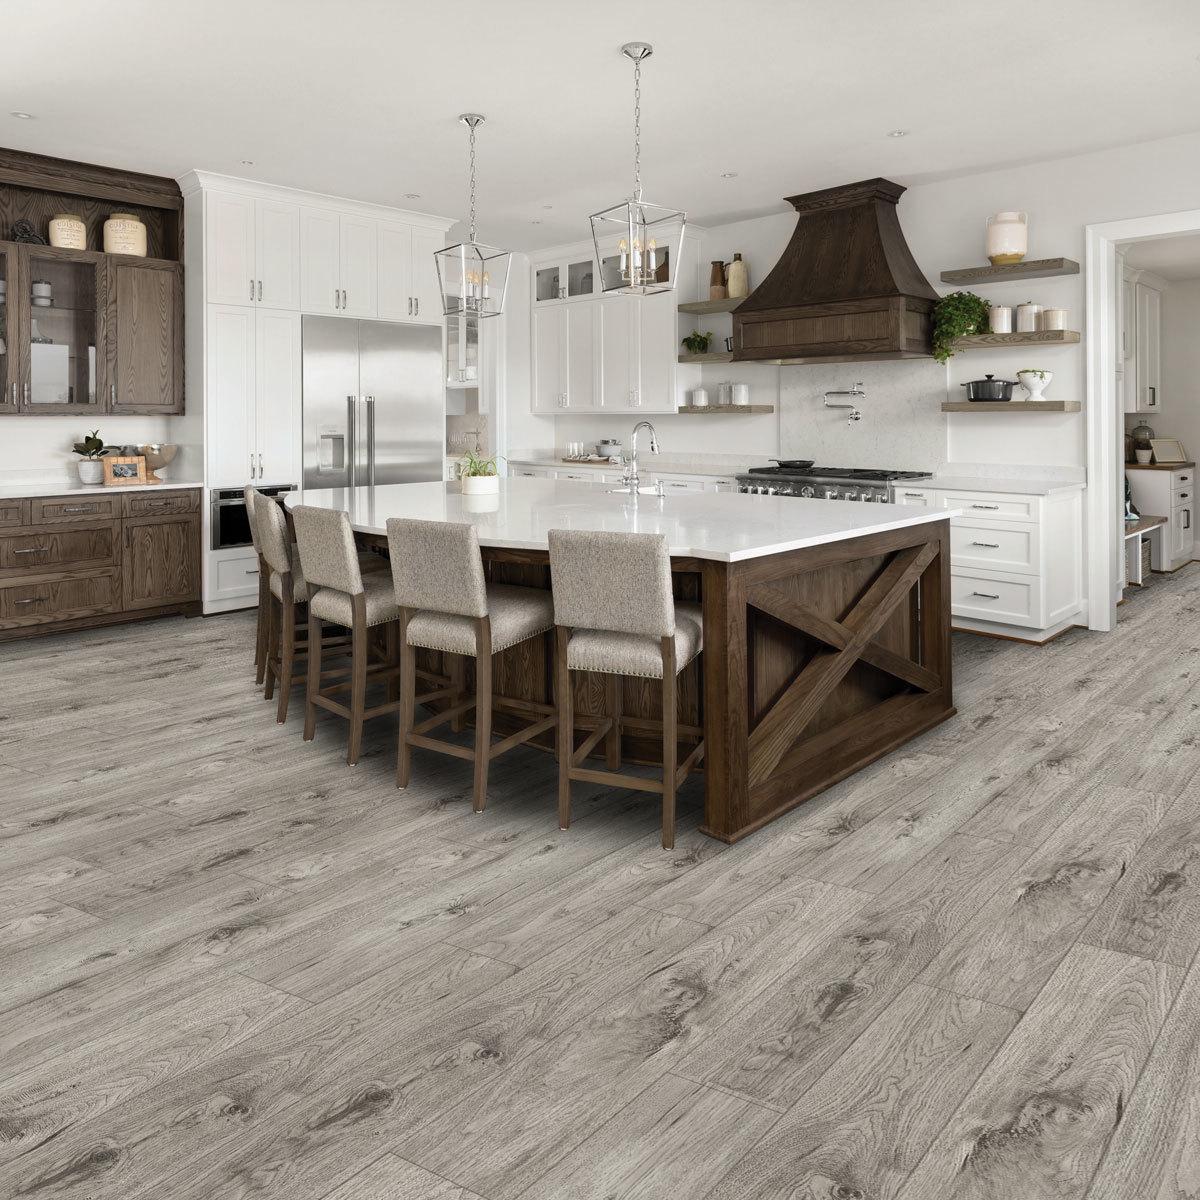 Golden Select Modern Grey Rigid Core SPC Luxury Vinyl Flooring Planks with  Foam Underlay - 5.5 m² Per Pack  Costco UK